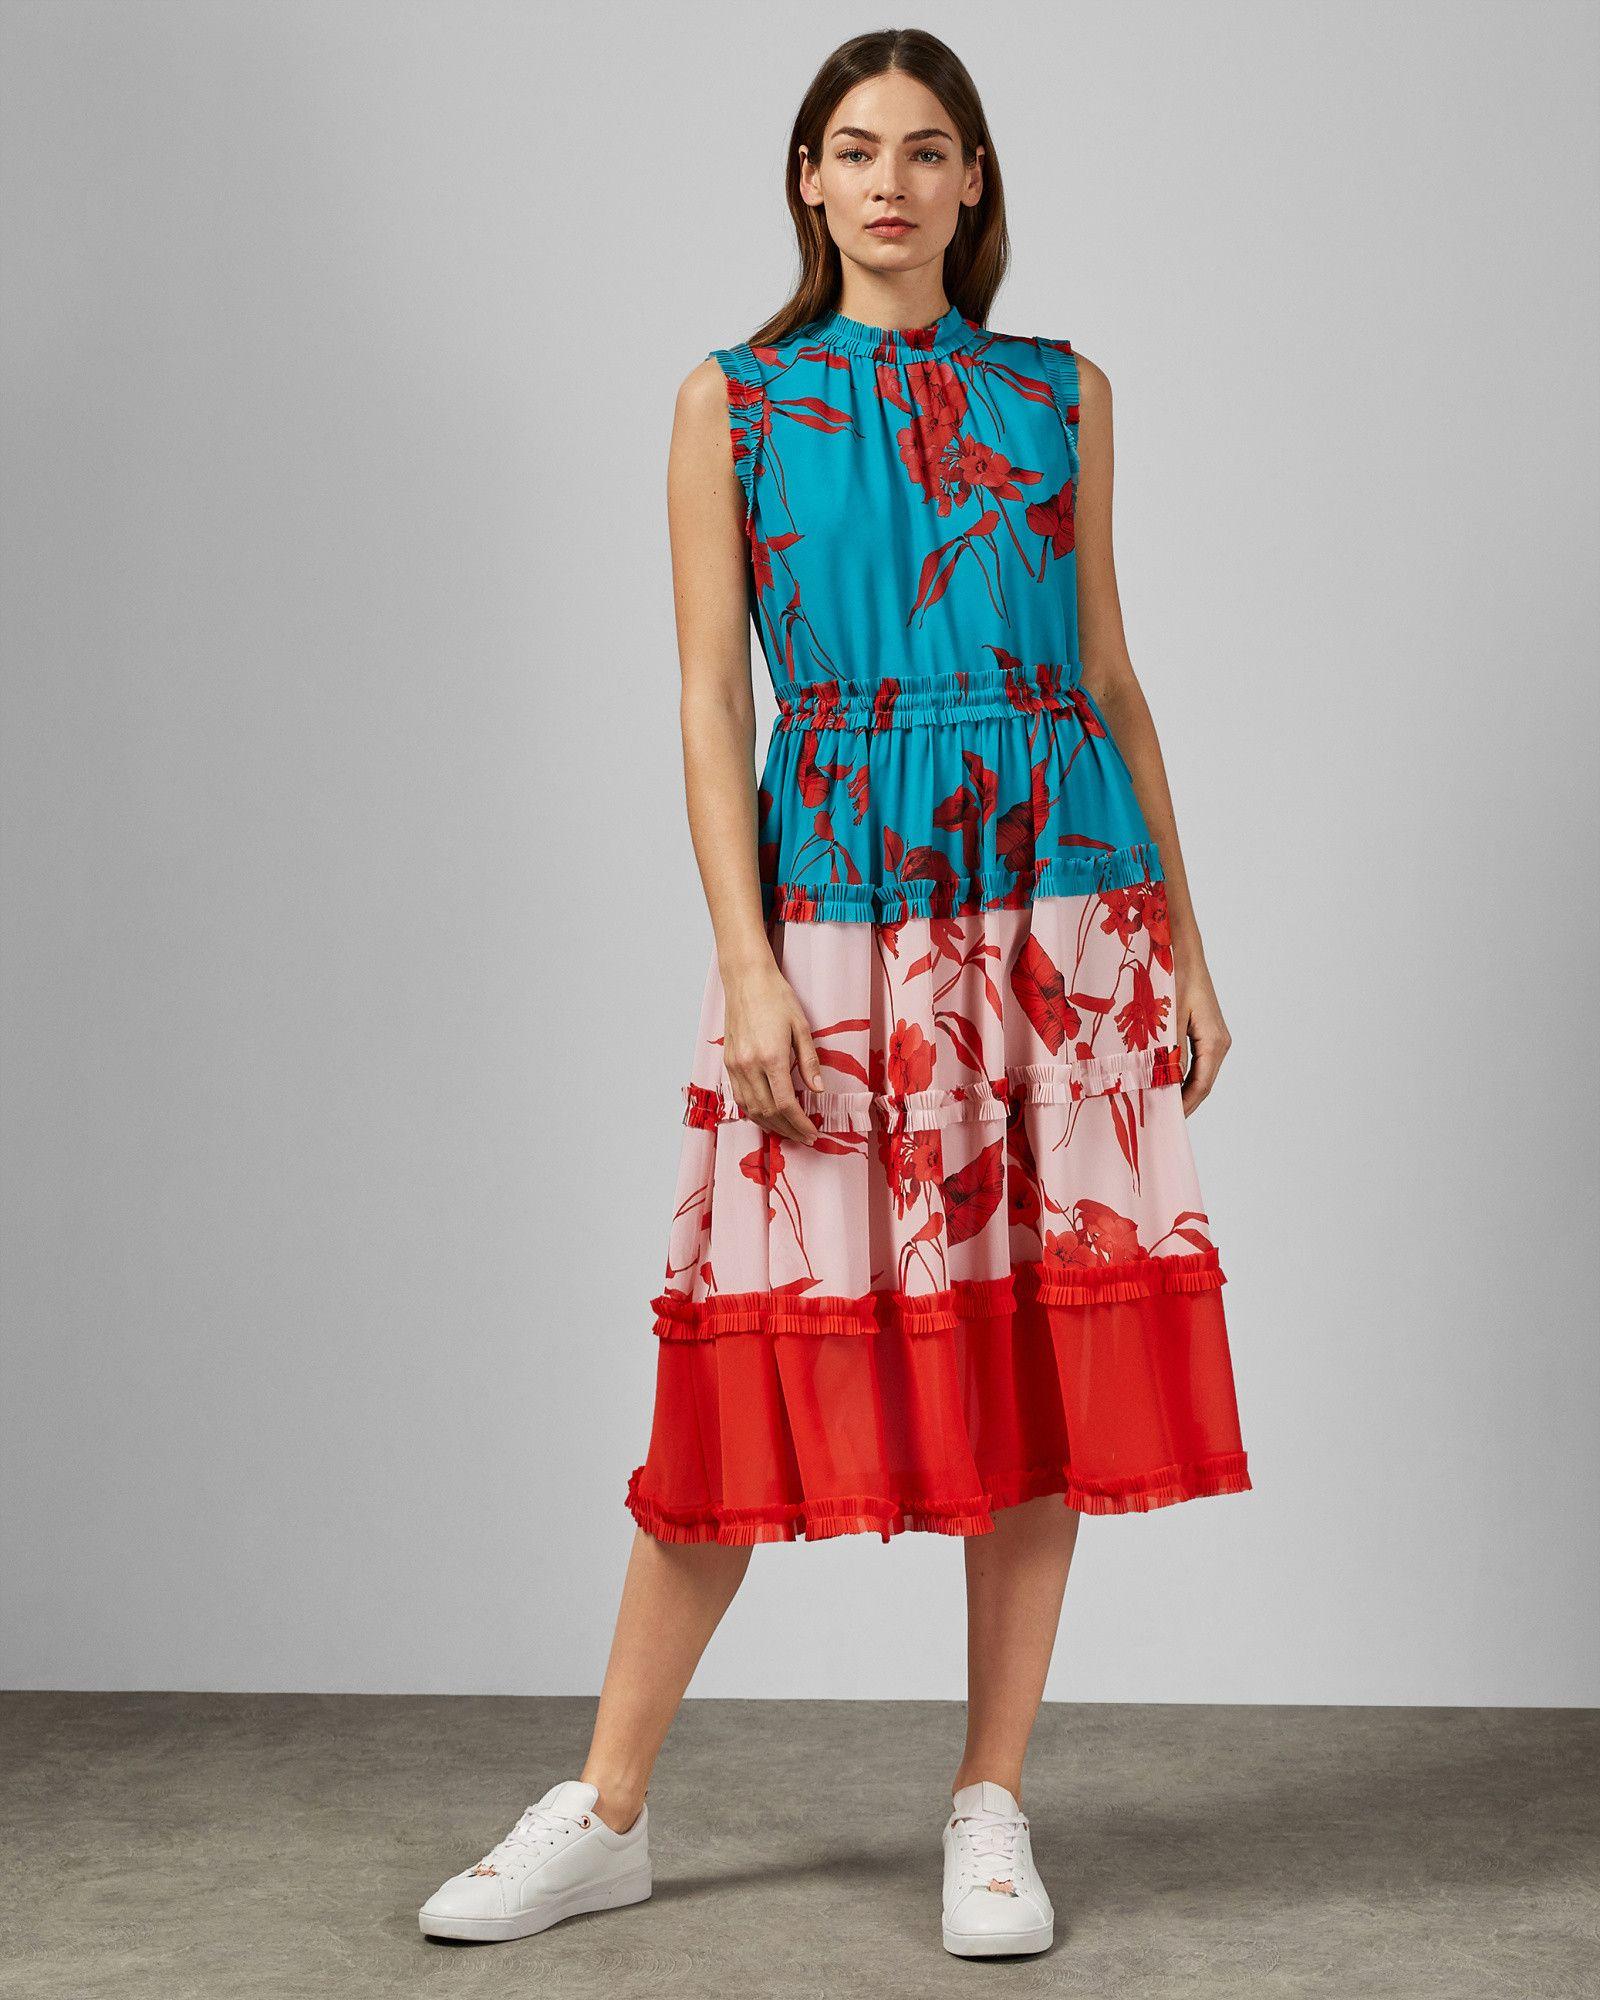 b4dbb72dd6 Fantasia Tiered Midi Dress. CAMELIS Fantasia tiered midi dress #TedToToe  Green Midi Dress, Ted Baker ...